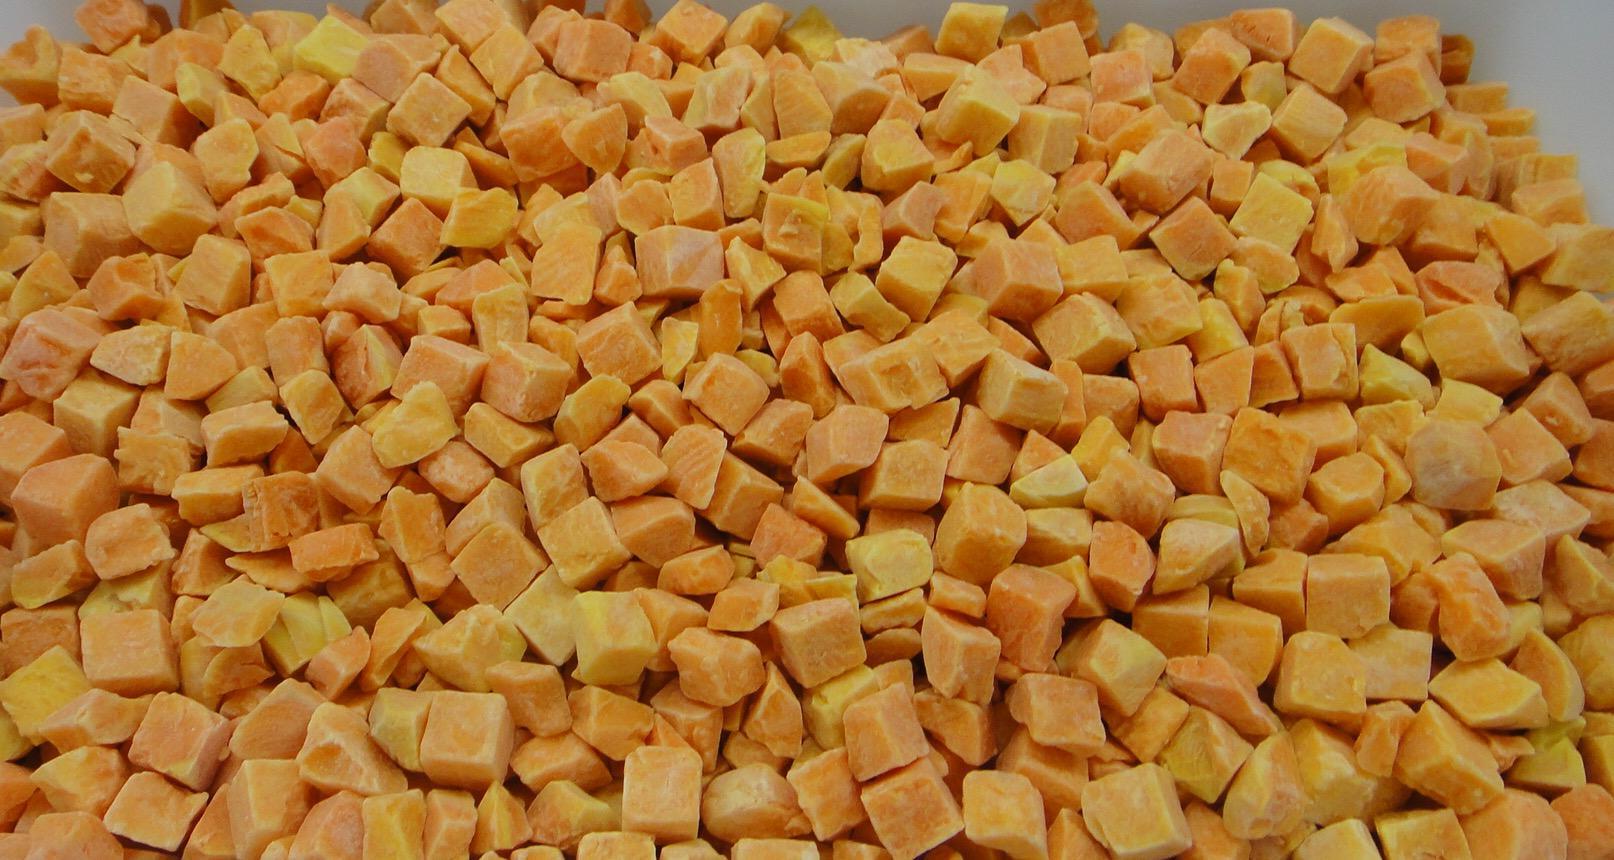 IQF Sweet Potato Dices,Frozen Sweet Potato Dices,IQF Cut Sweet Potato 8